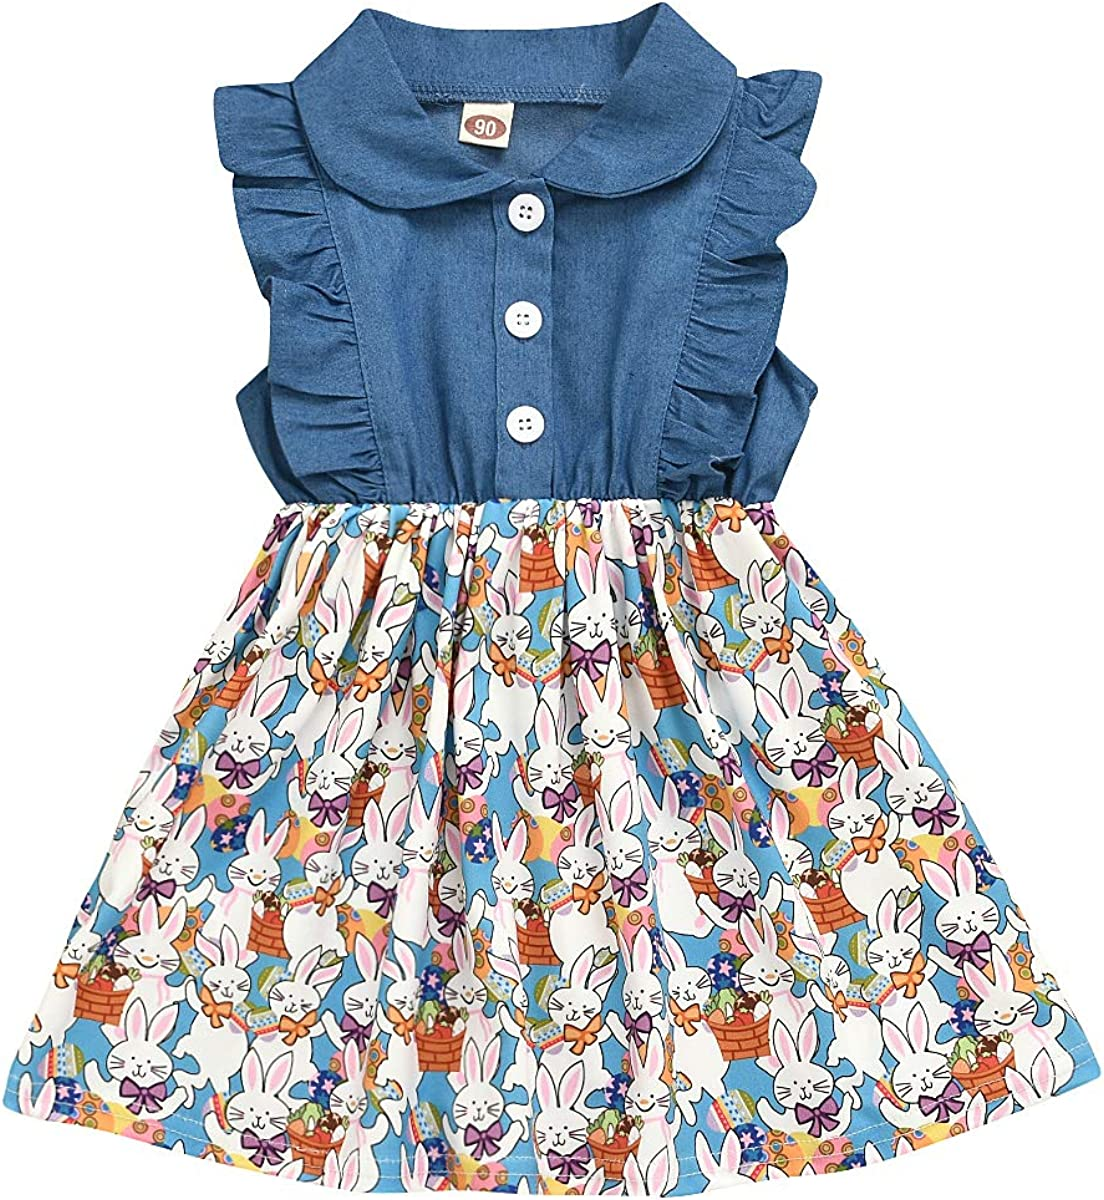 Goodplayer Newborn Baby Girl Easter Dress Lapel Denim Jacket Sleeveless Bunny Dresses